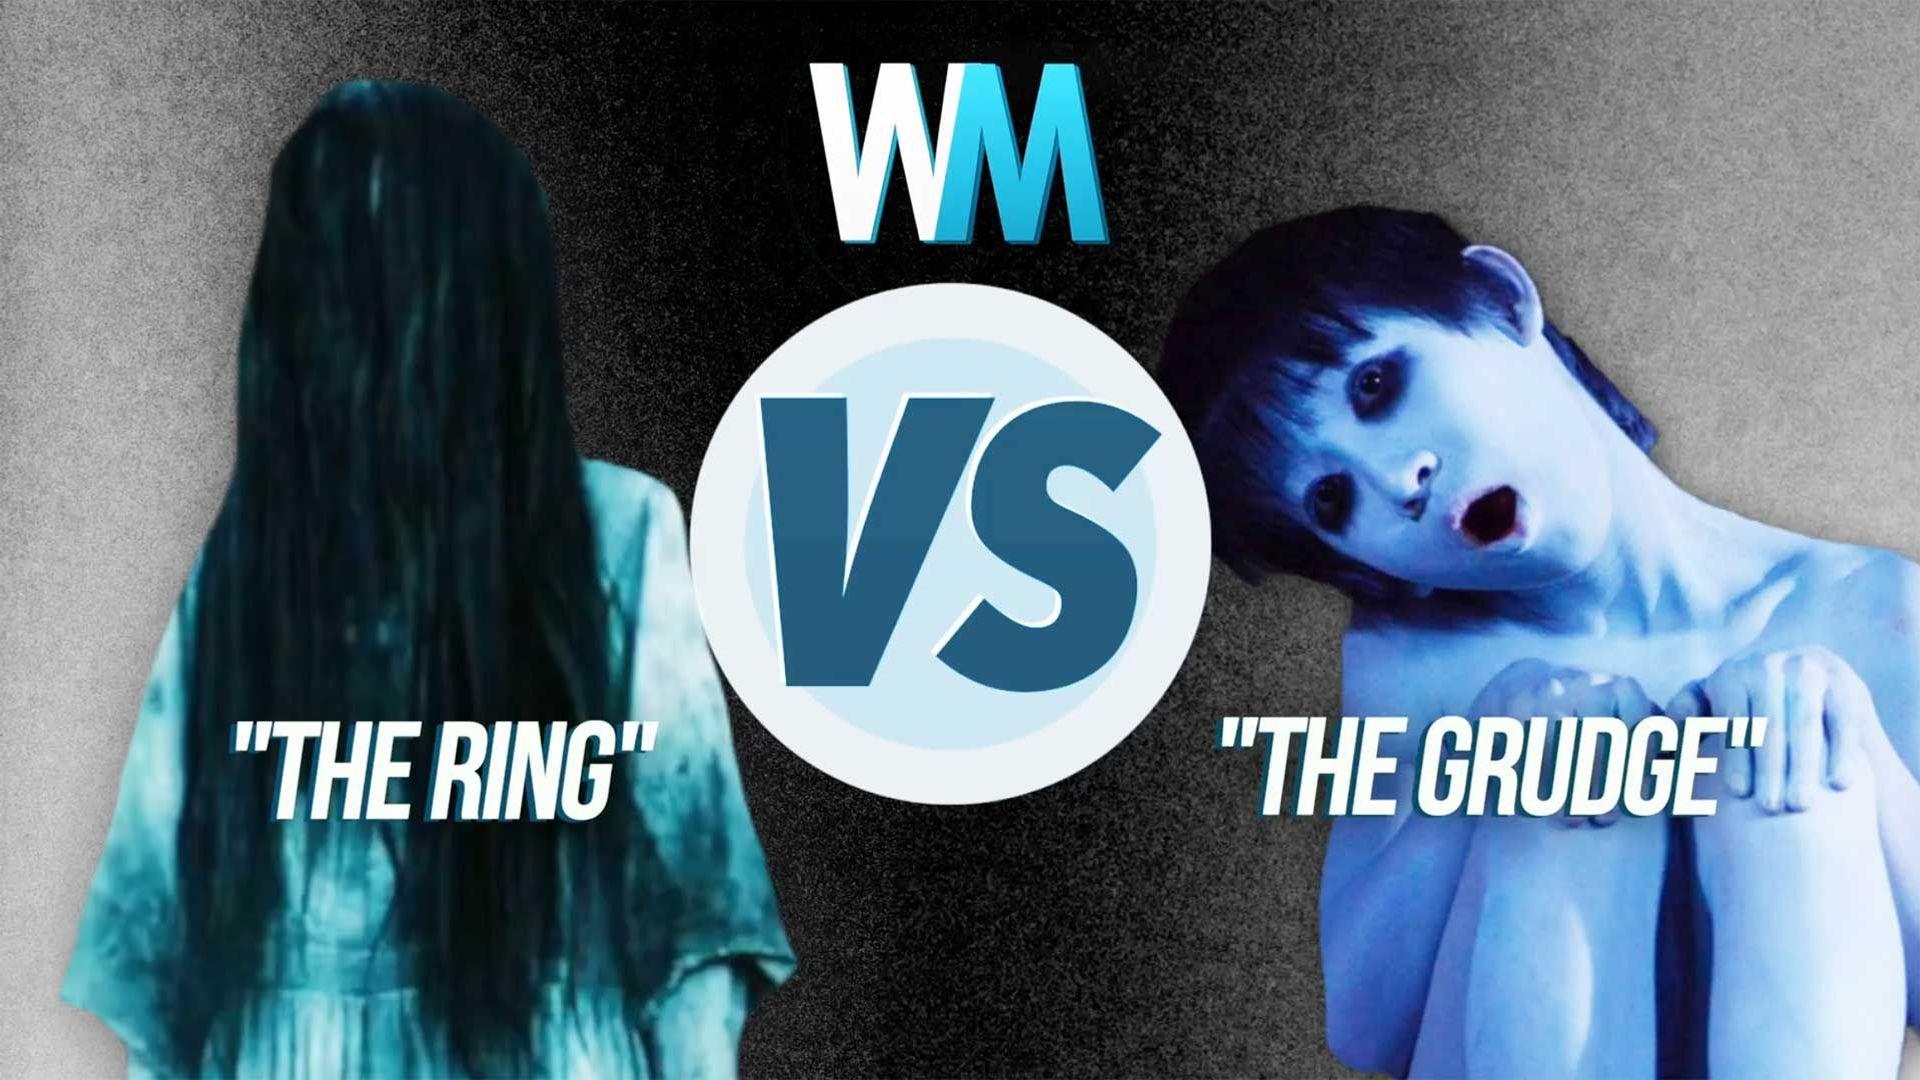 the-grudge-vs-the-ring-noovie-watch-mojo